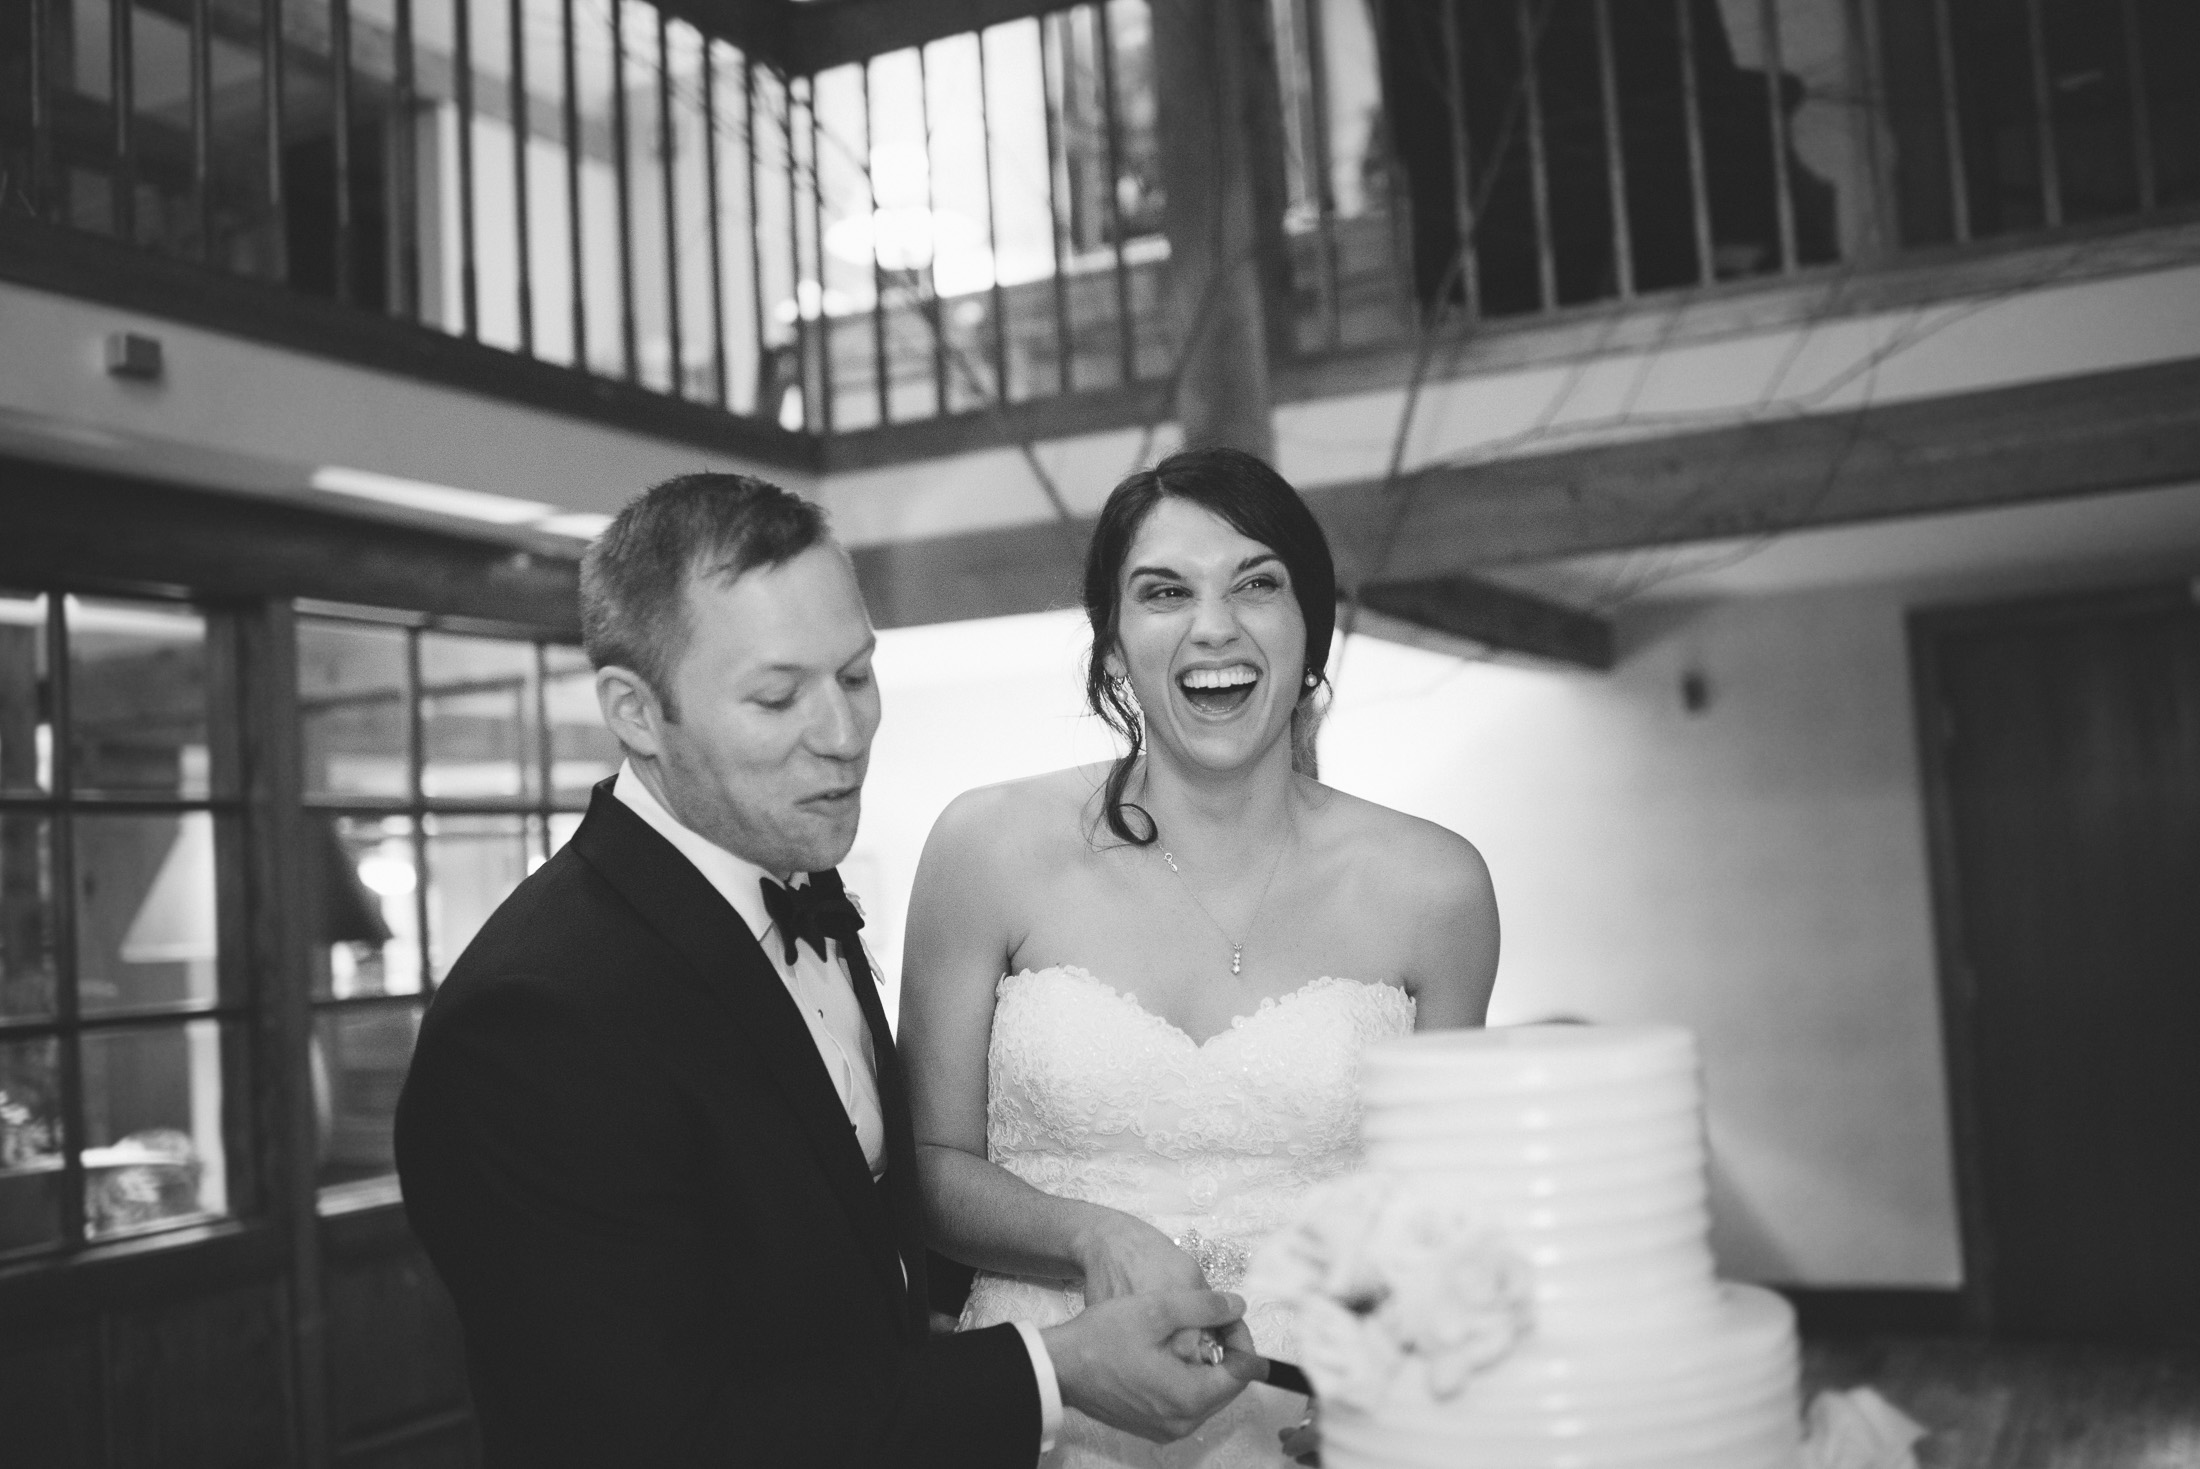 NH Wedding Photographer: reception cake cutting